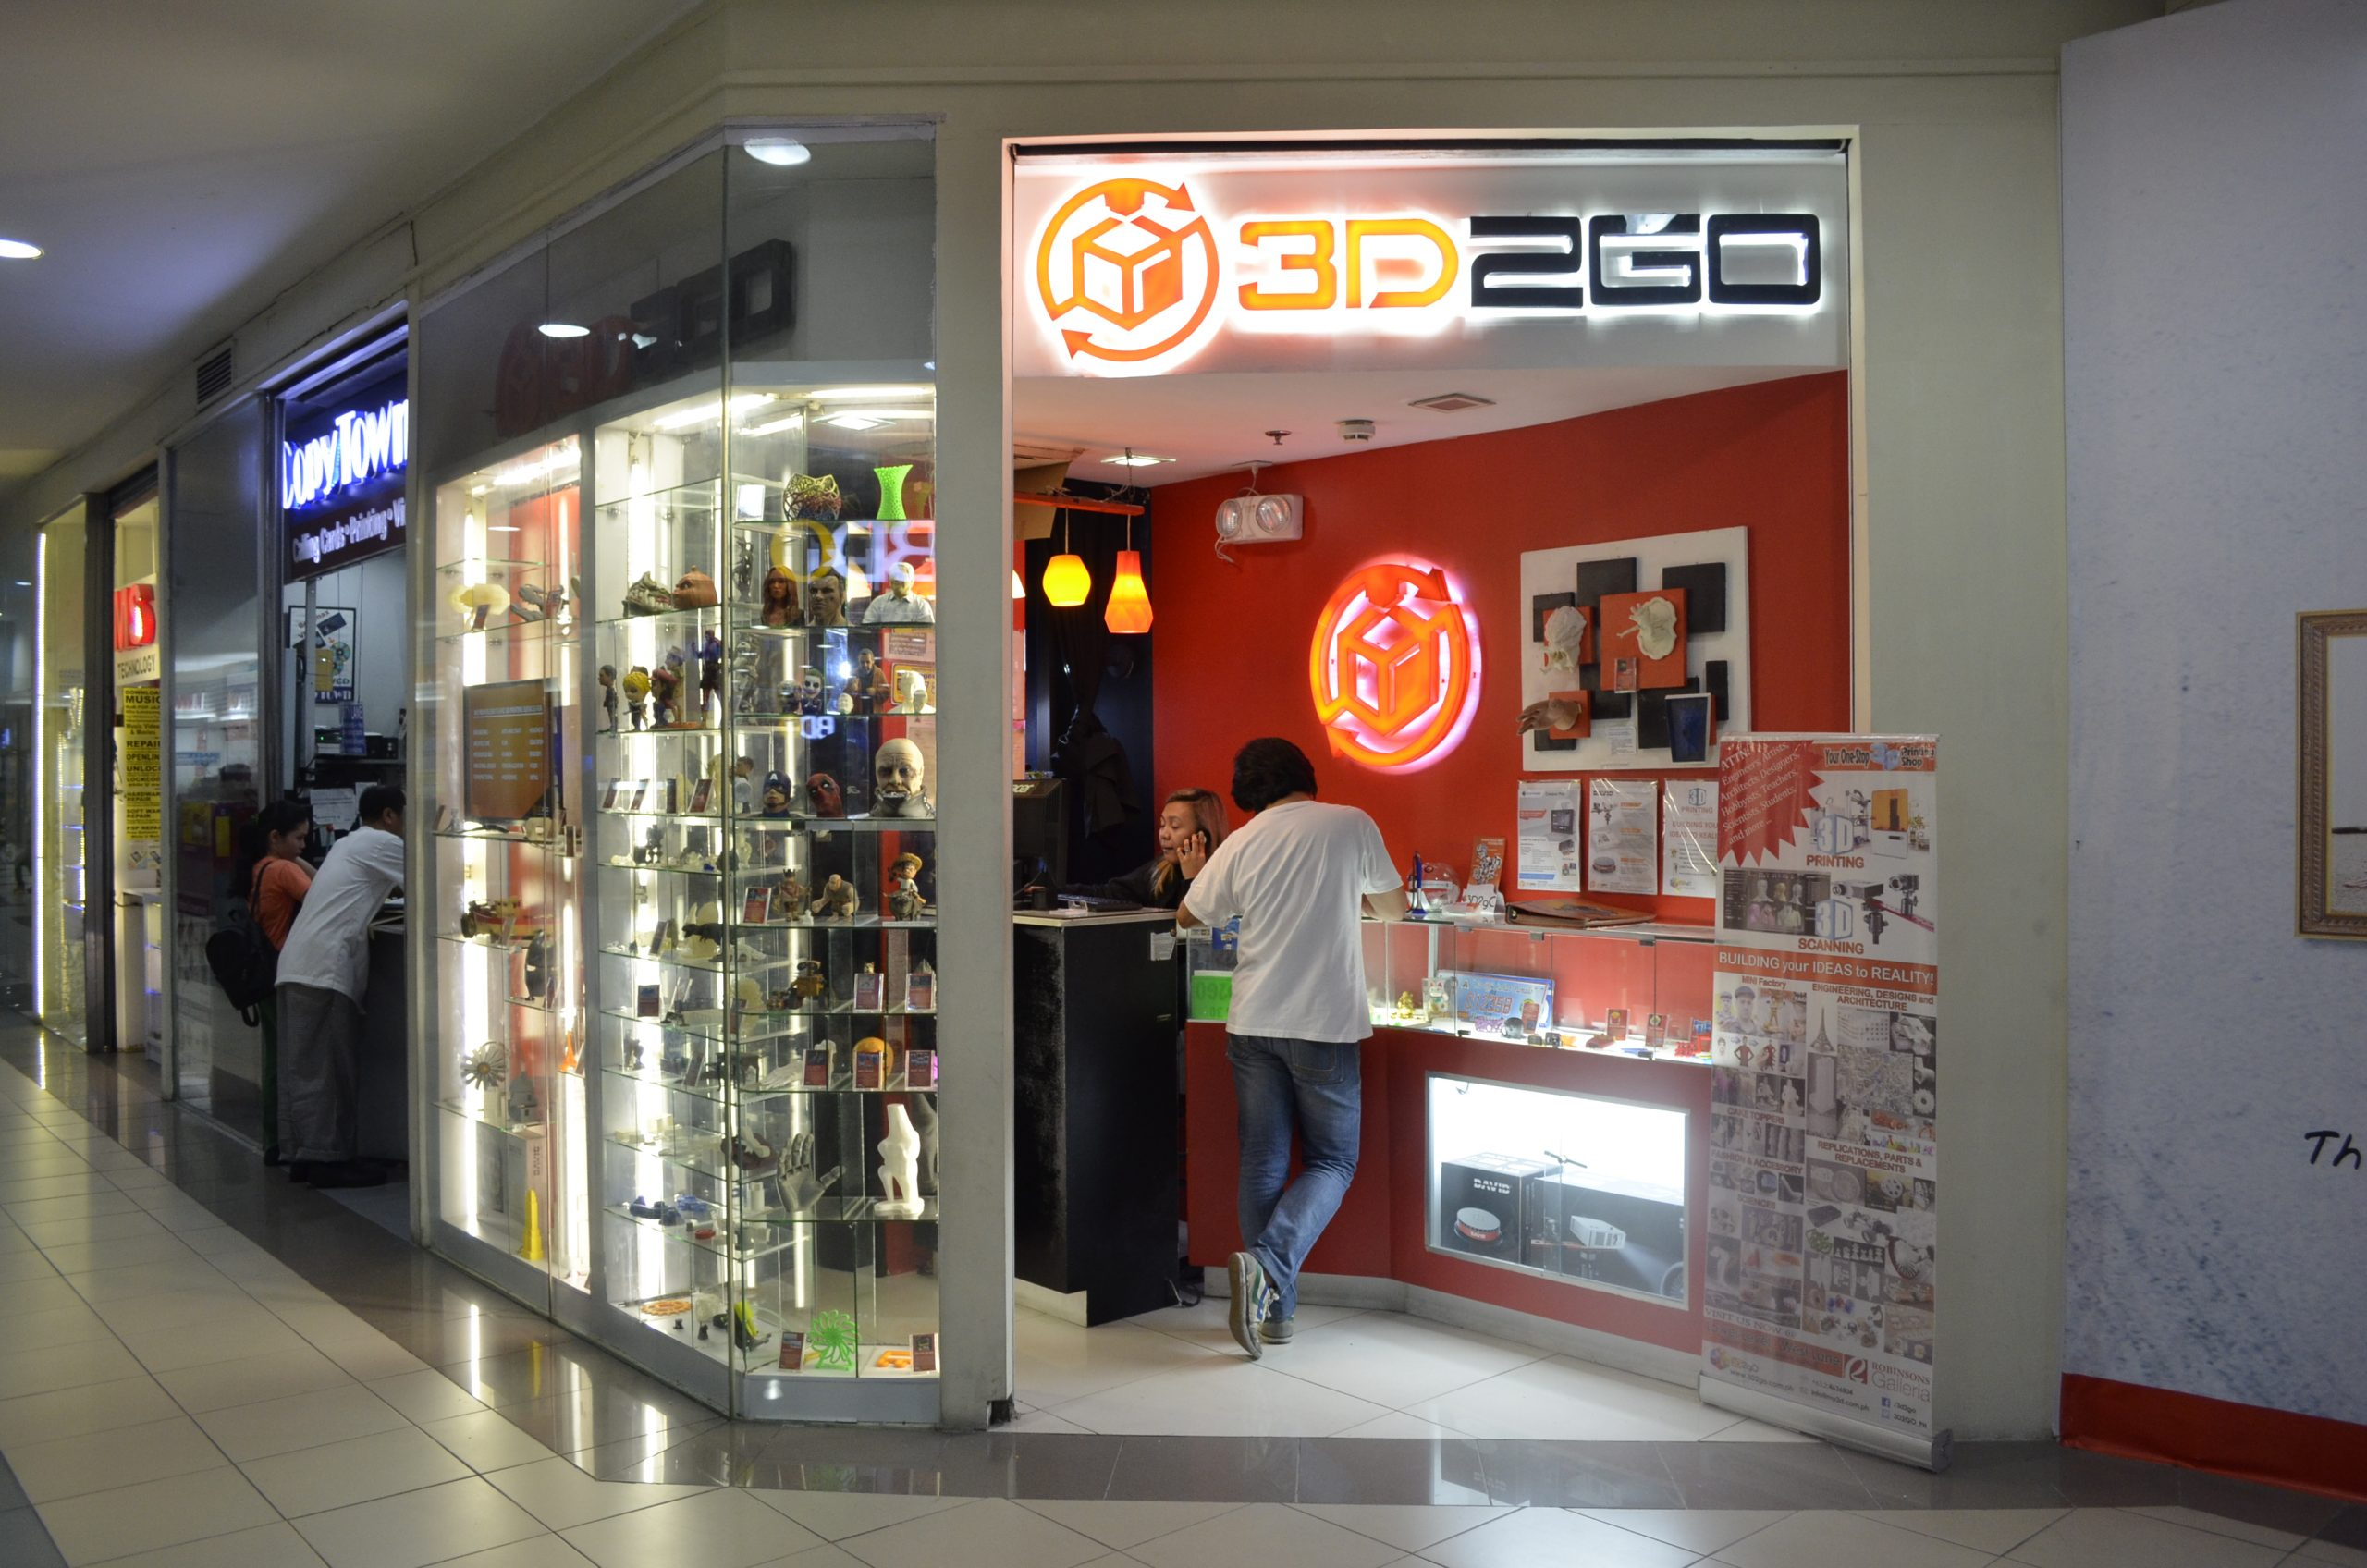 3D2GO Galleria branch